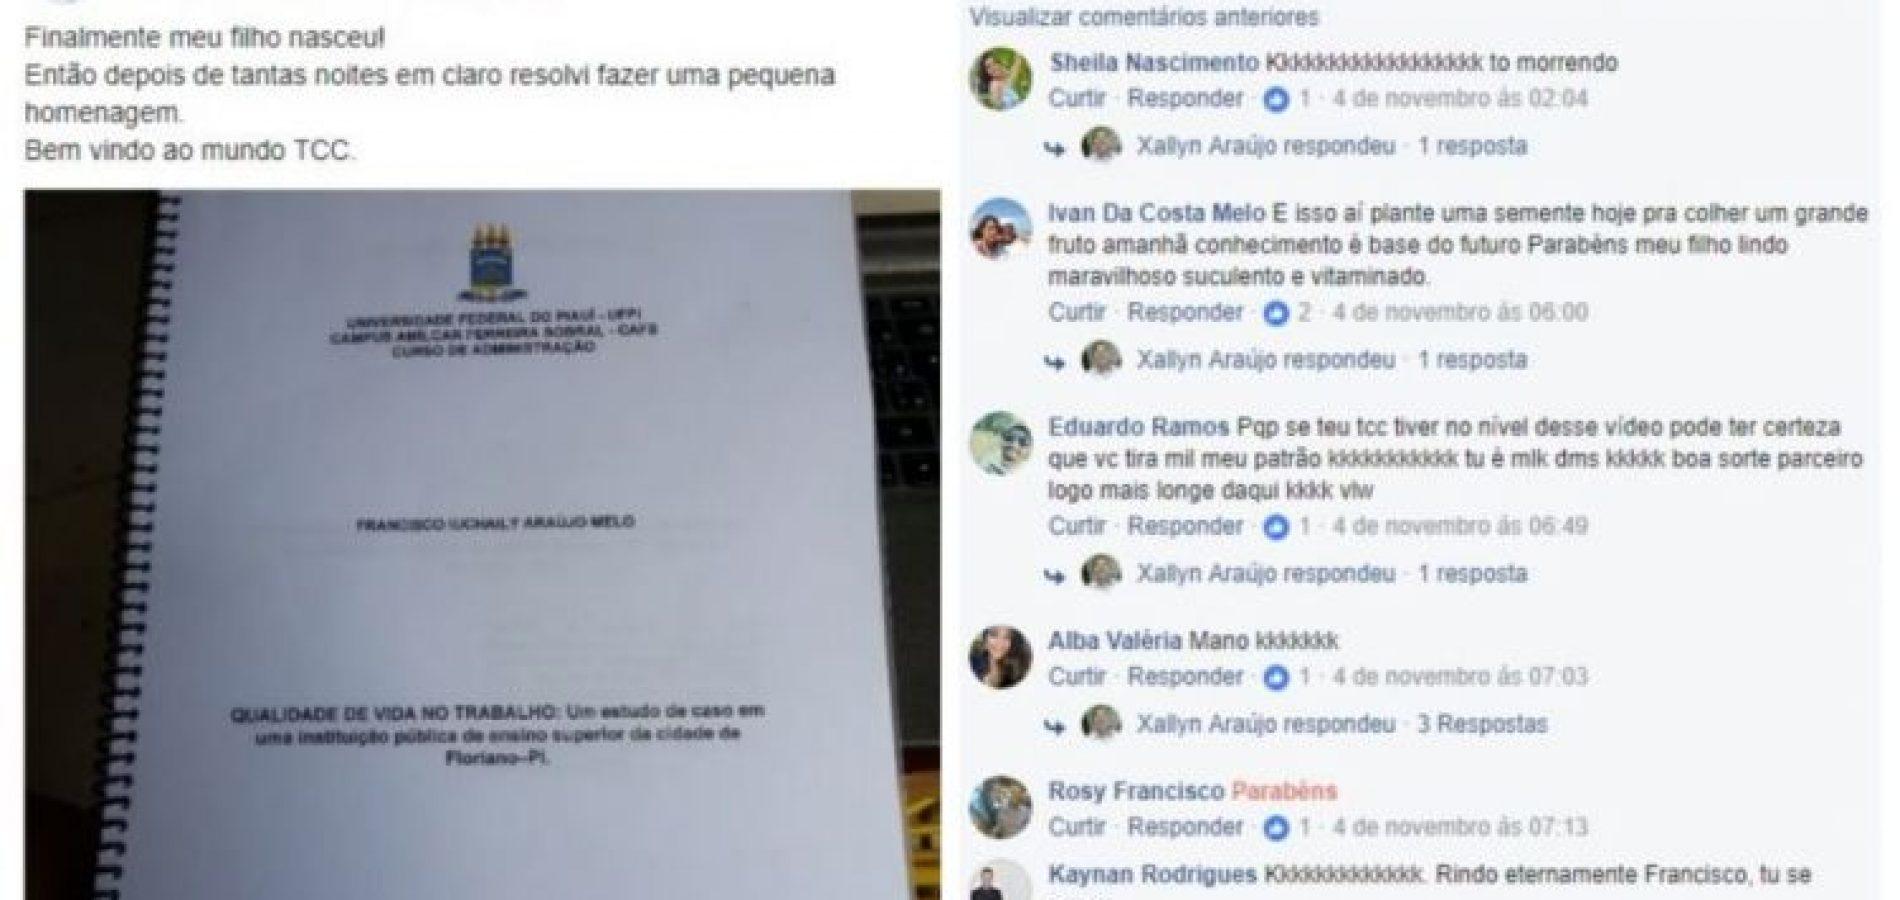 Vídeo bem-humorado de aluno piauiense mostrando TCC pronto viraliza nas redes sociais